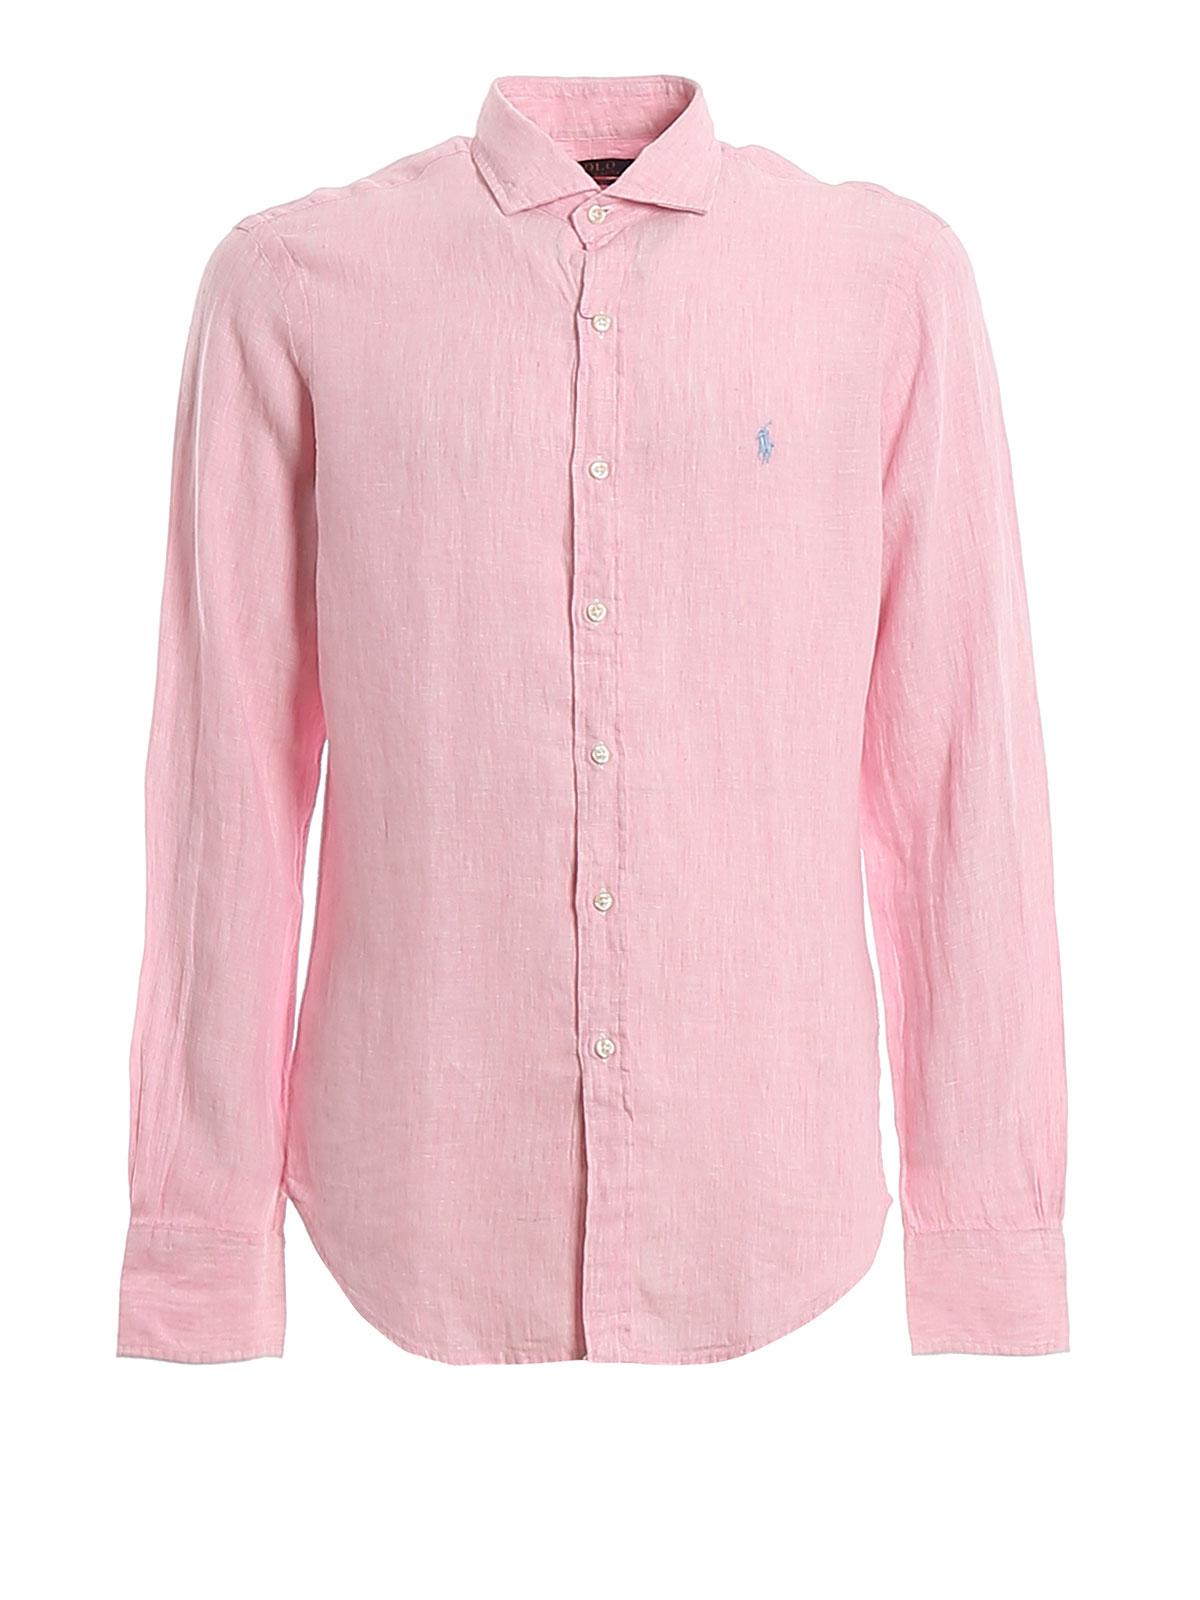 Picture of POLO RALPH LAUREN   Men's Linen French Collar Shirt